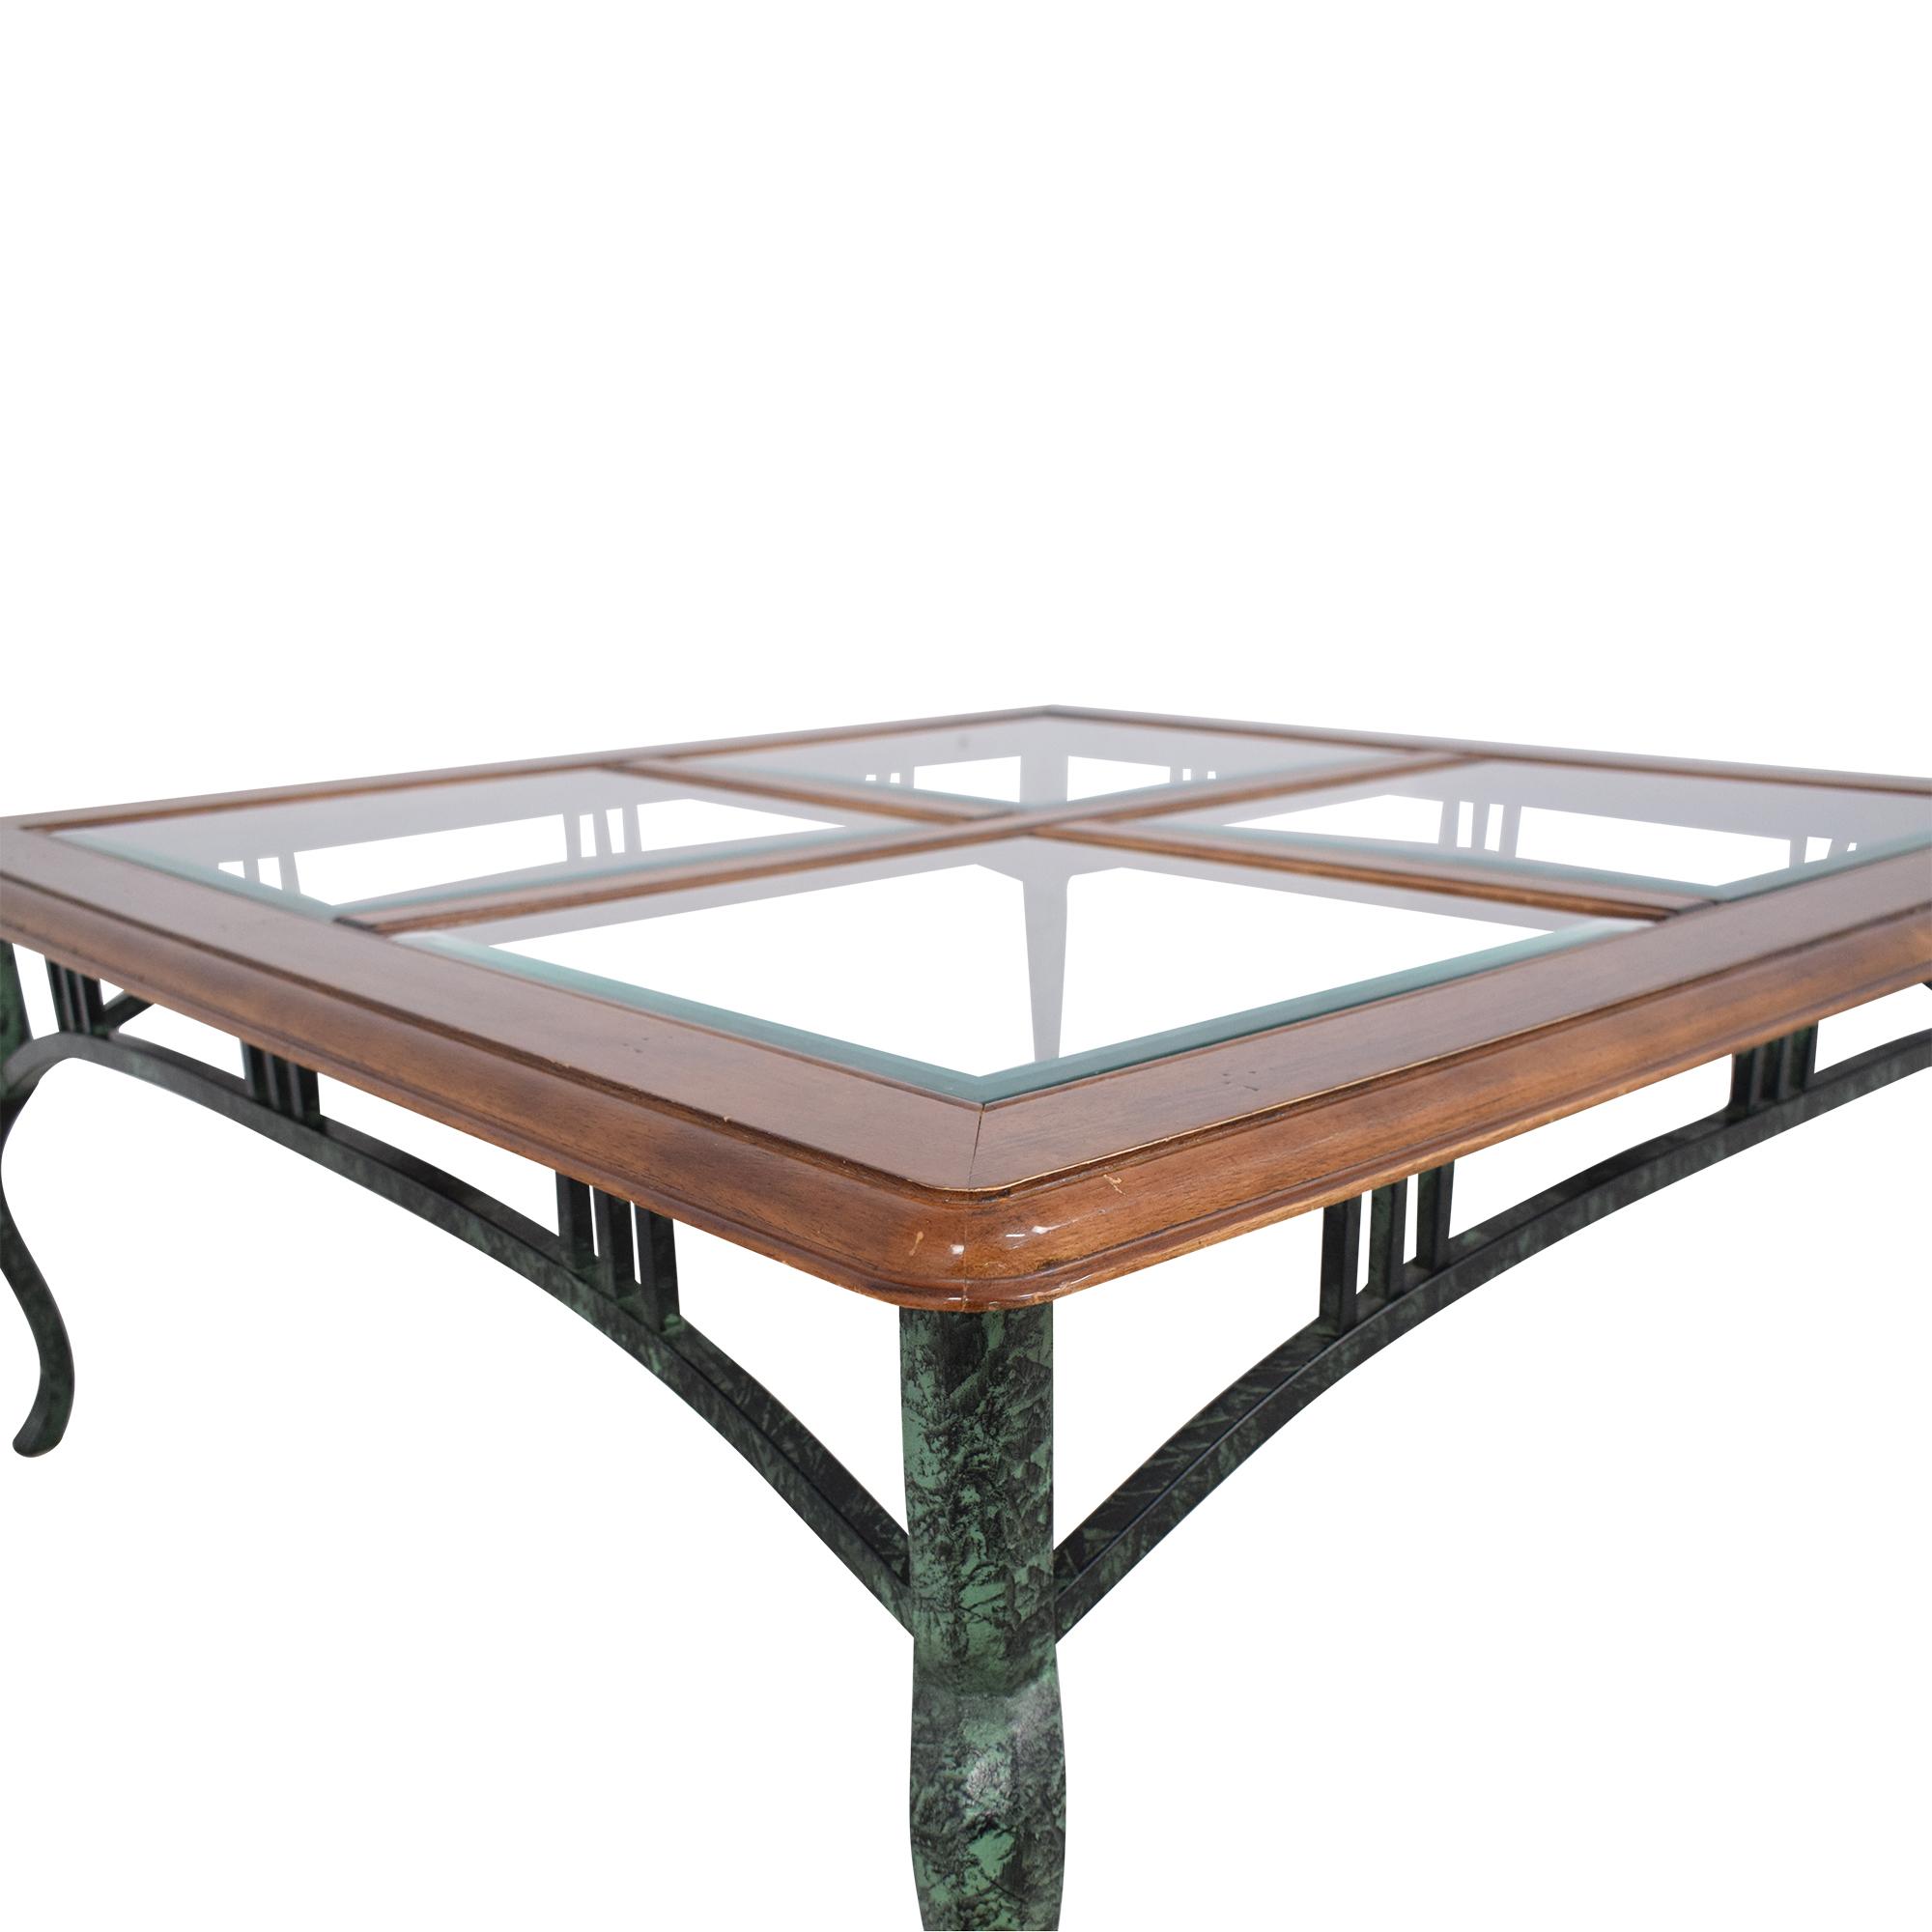 Ethan Allen Ethan Allen Glass Coffee Table ma